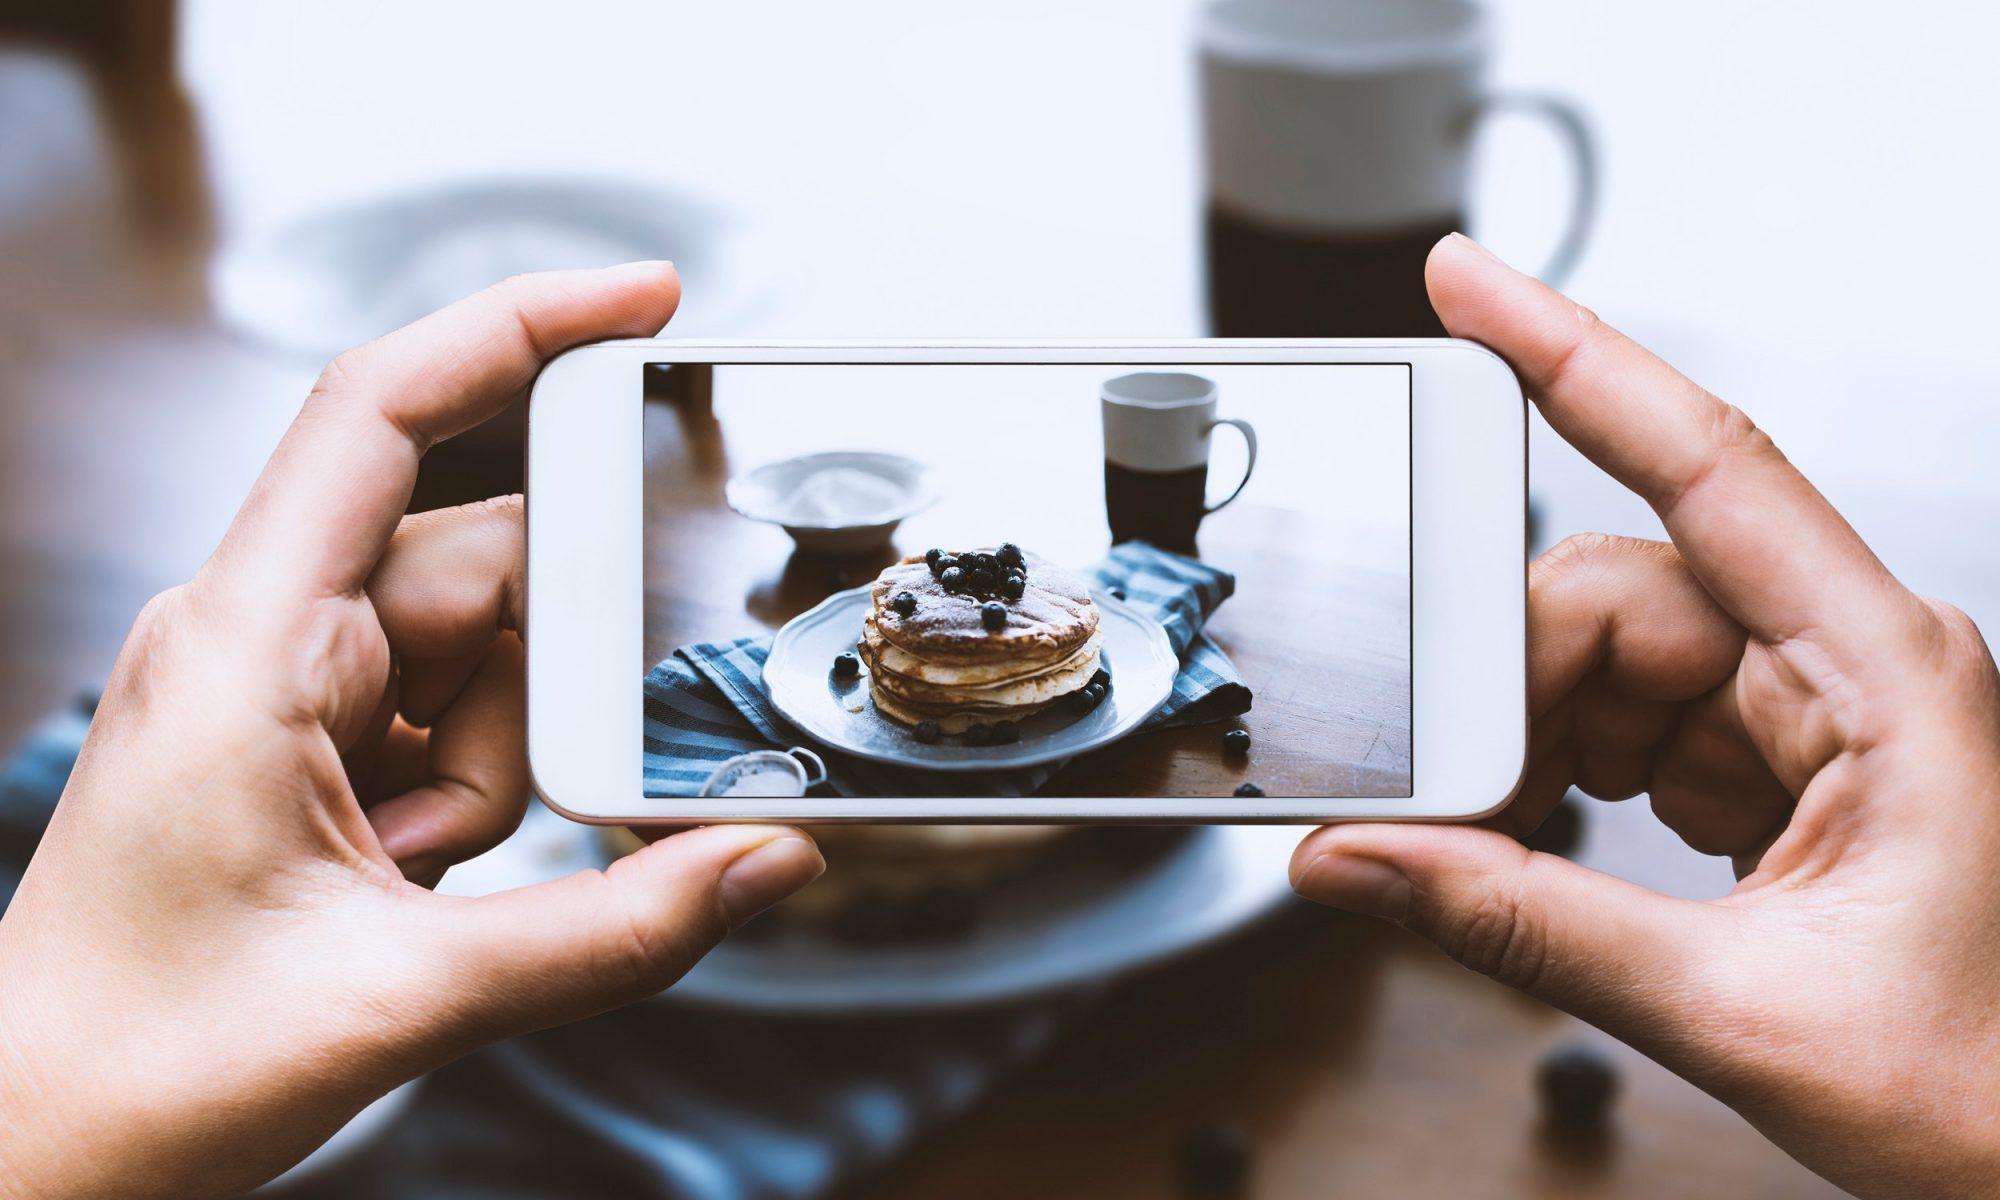 food photo technology